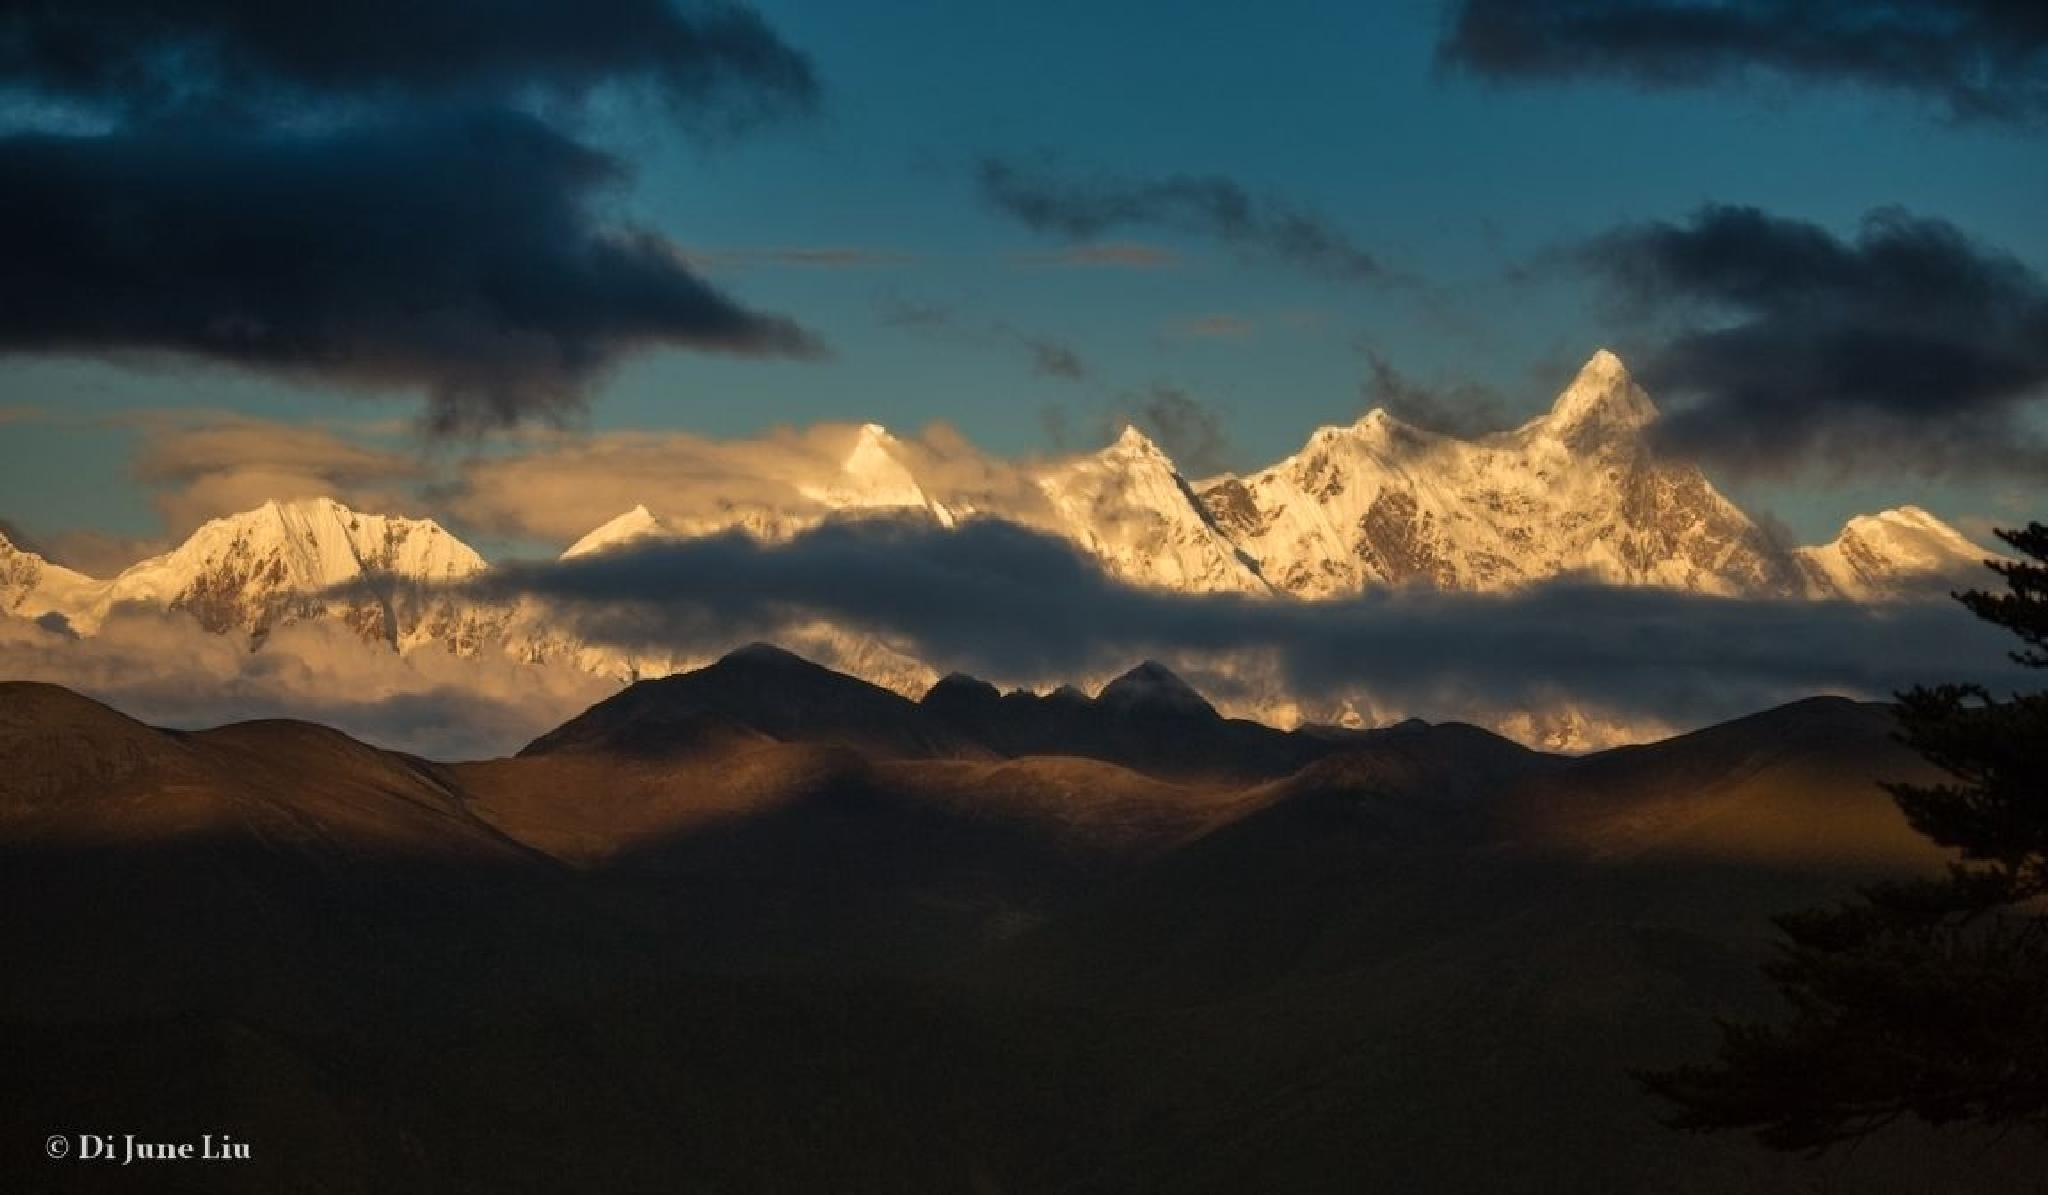 Namjagbarwa Peak 7782m, 15e plus haute du monde by dijune